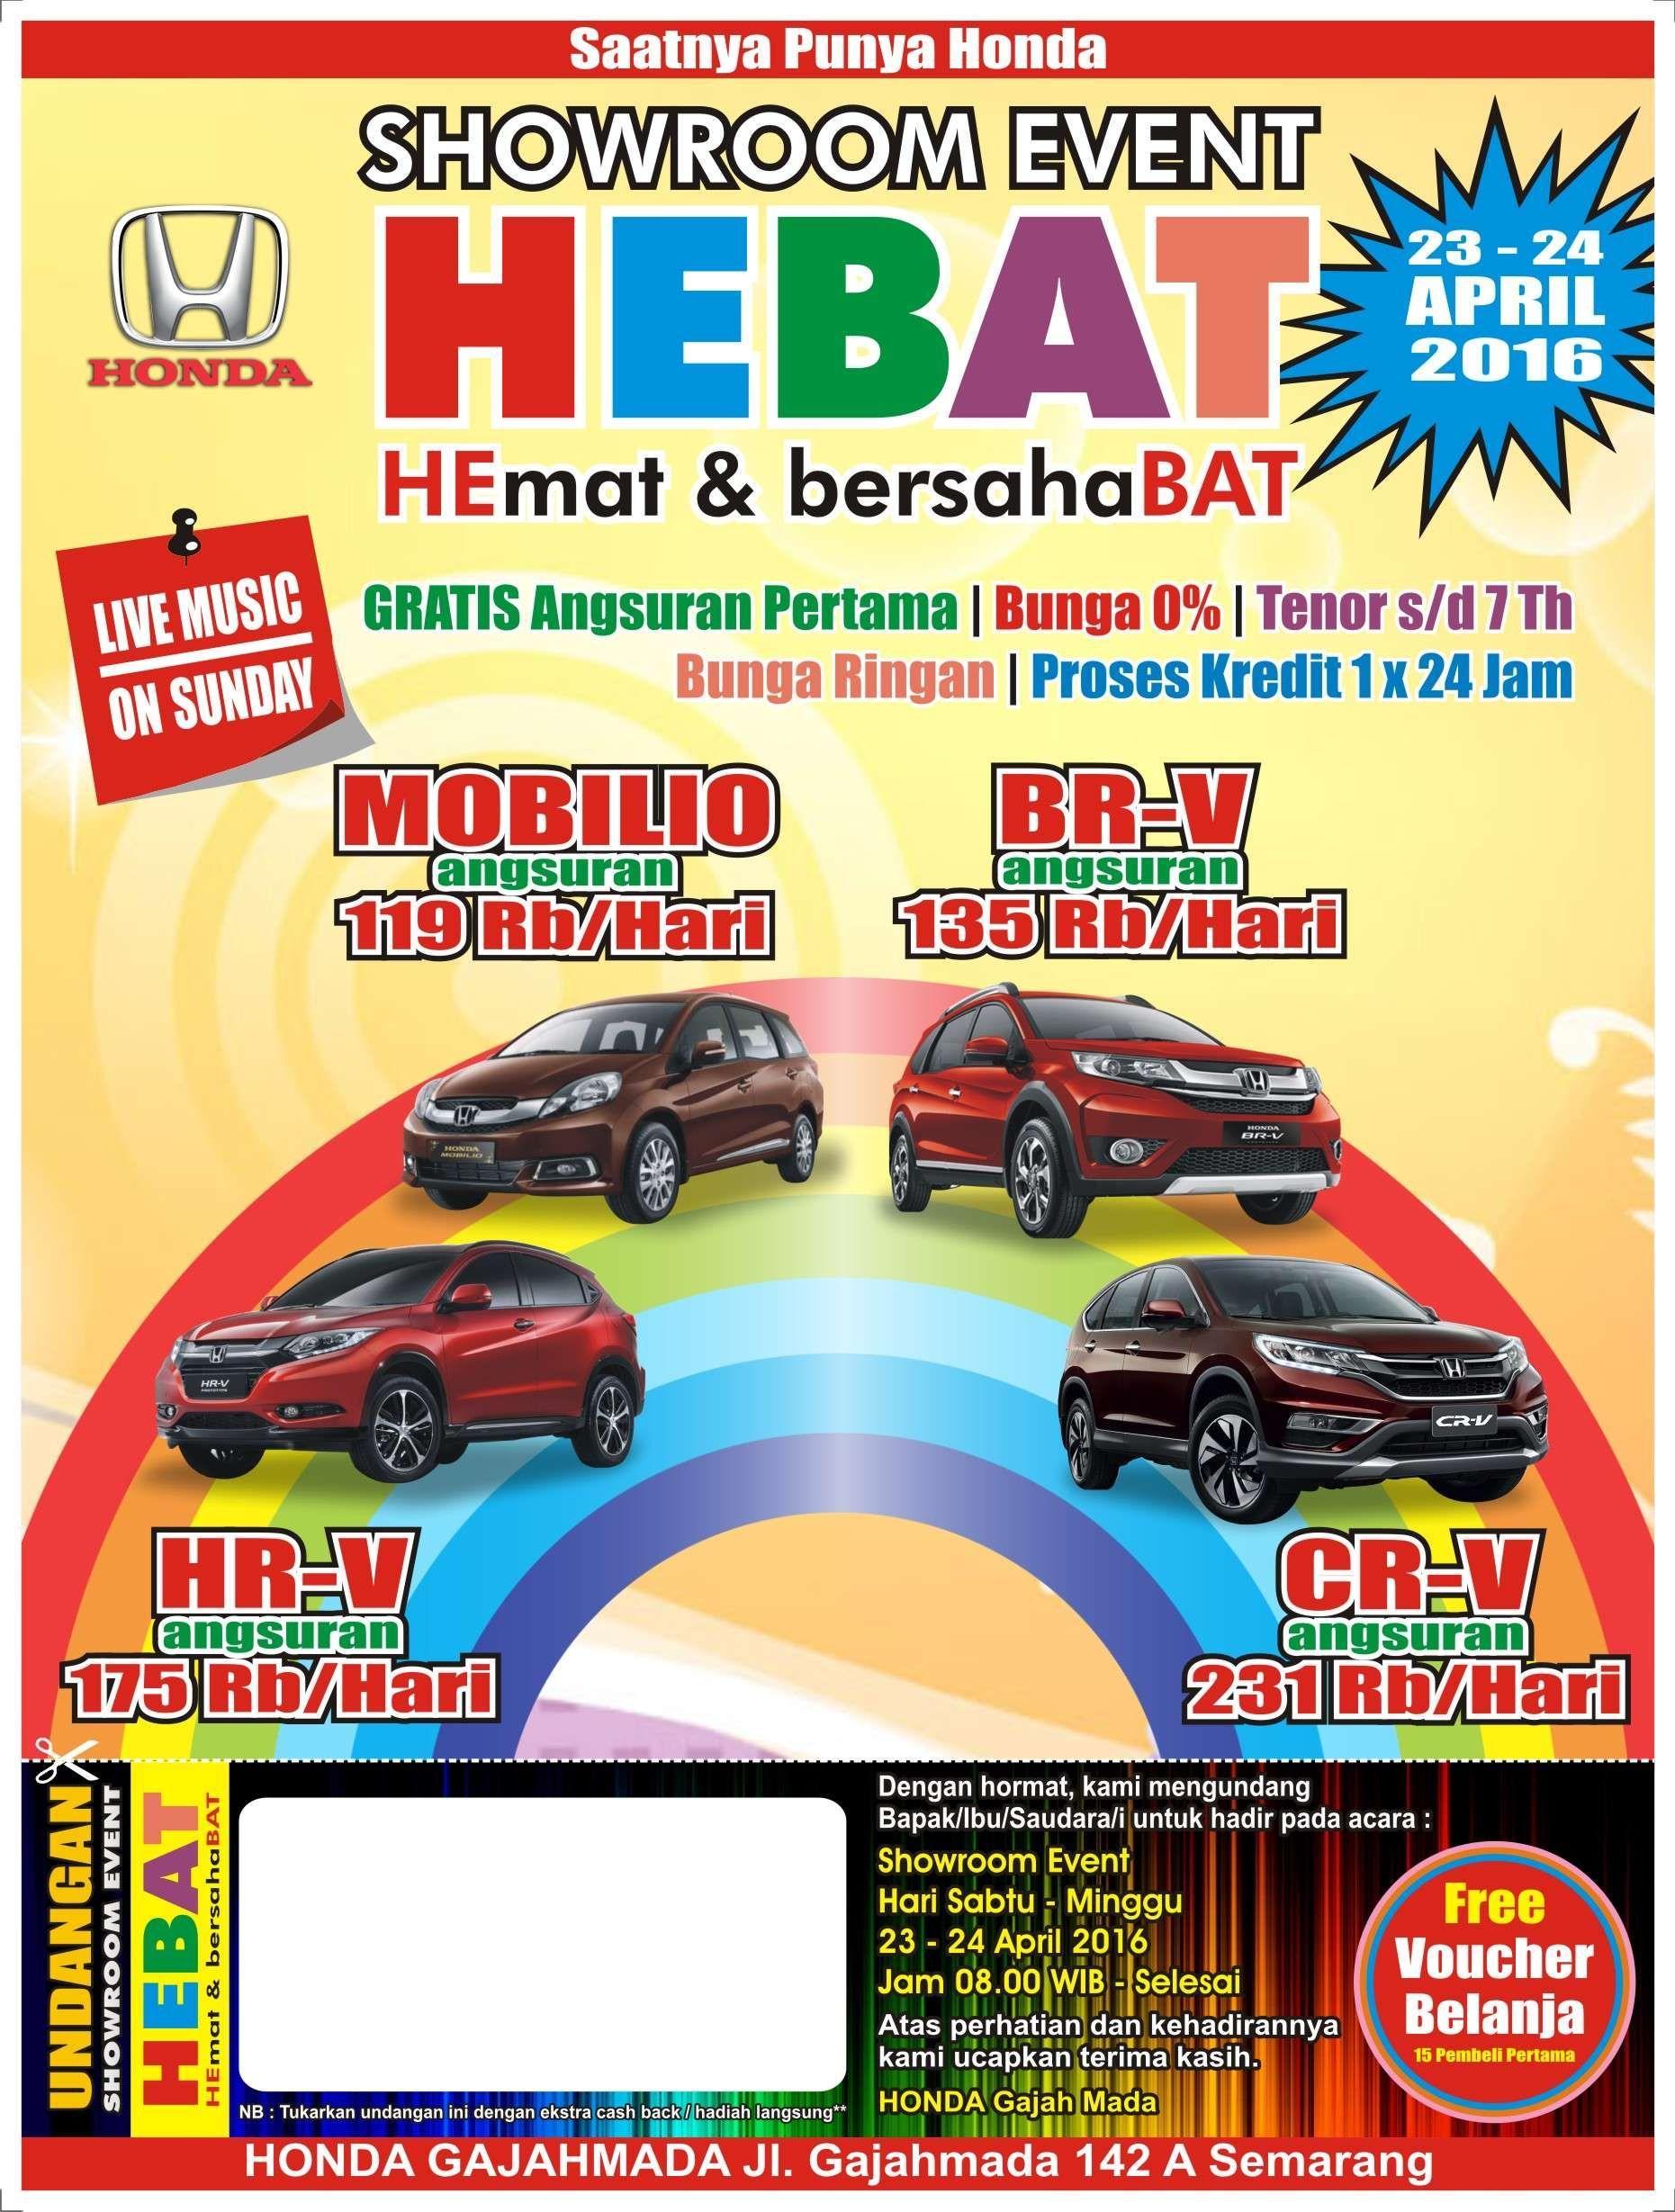 Promo WOW Honda Gajahmada Showroom Event Info Harga